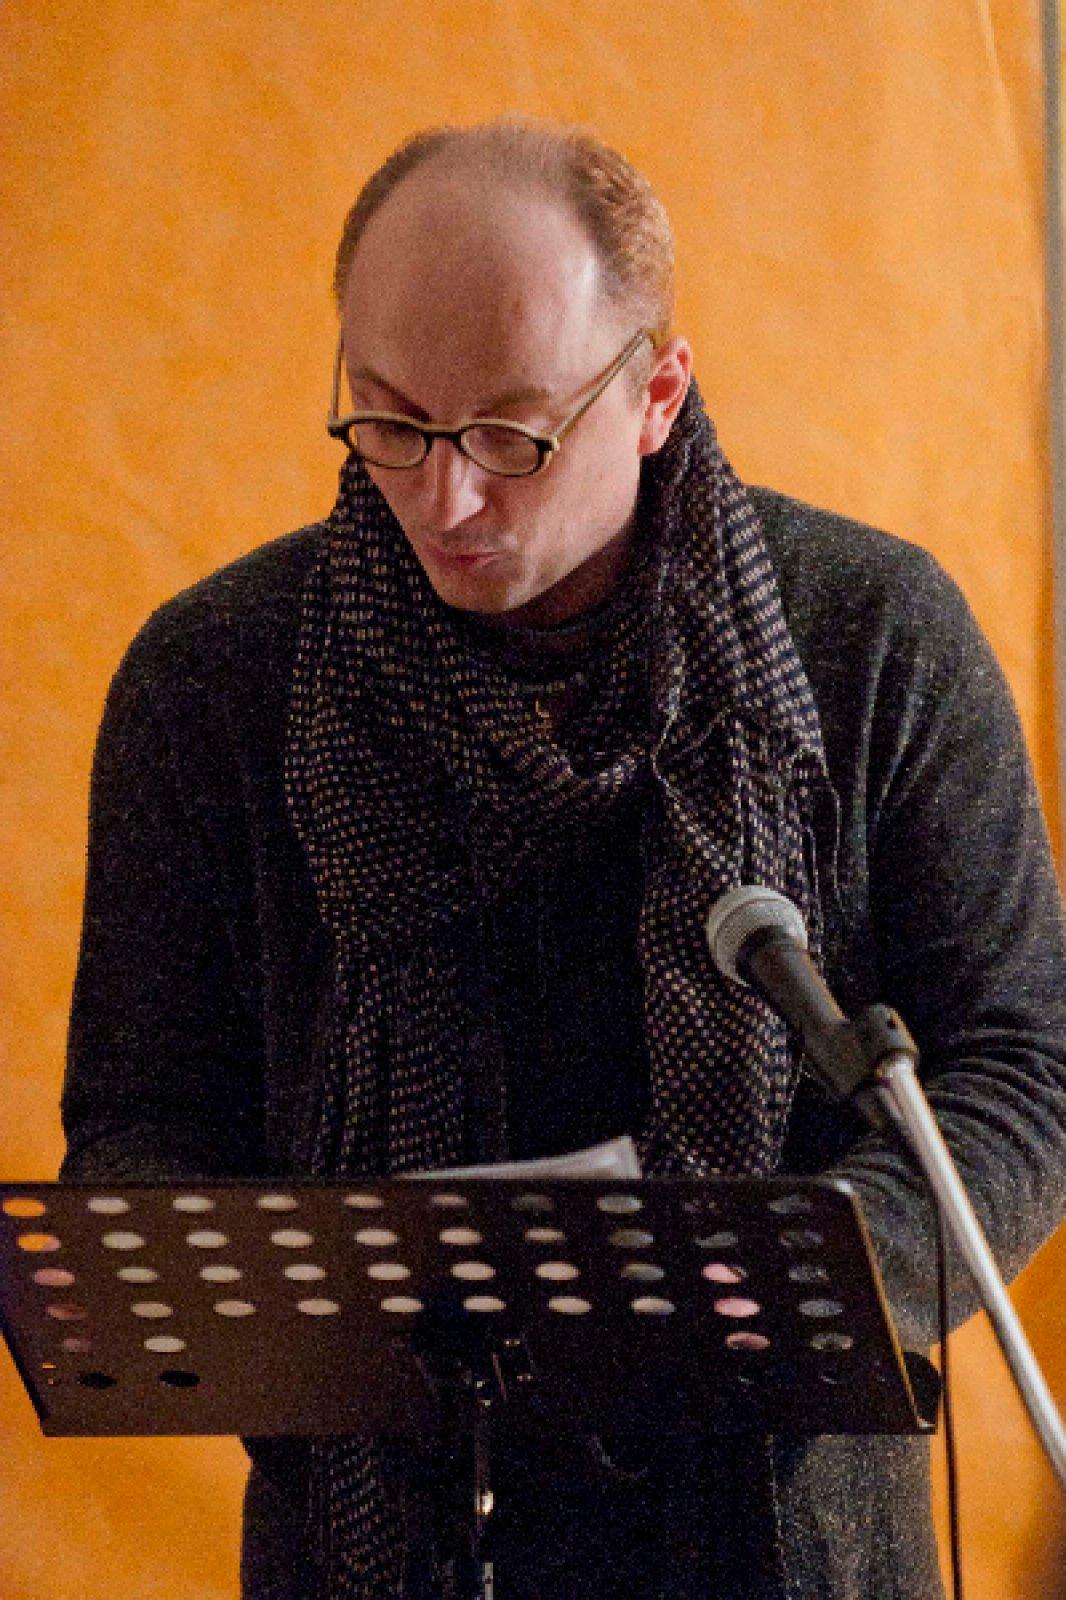 Alessandro Chiaf